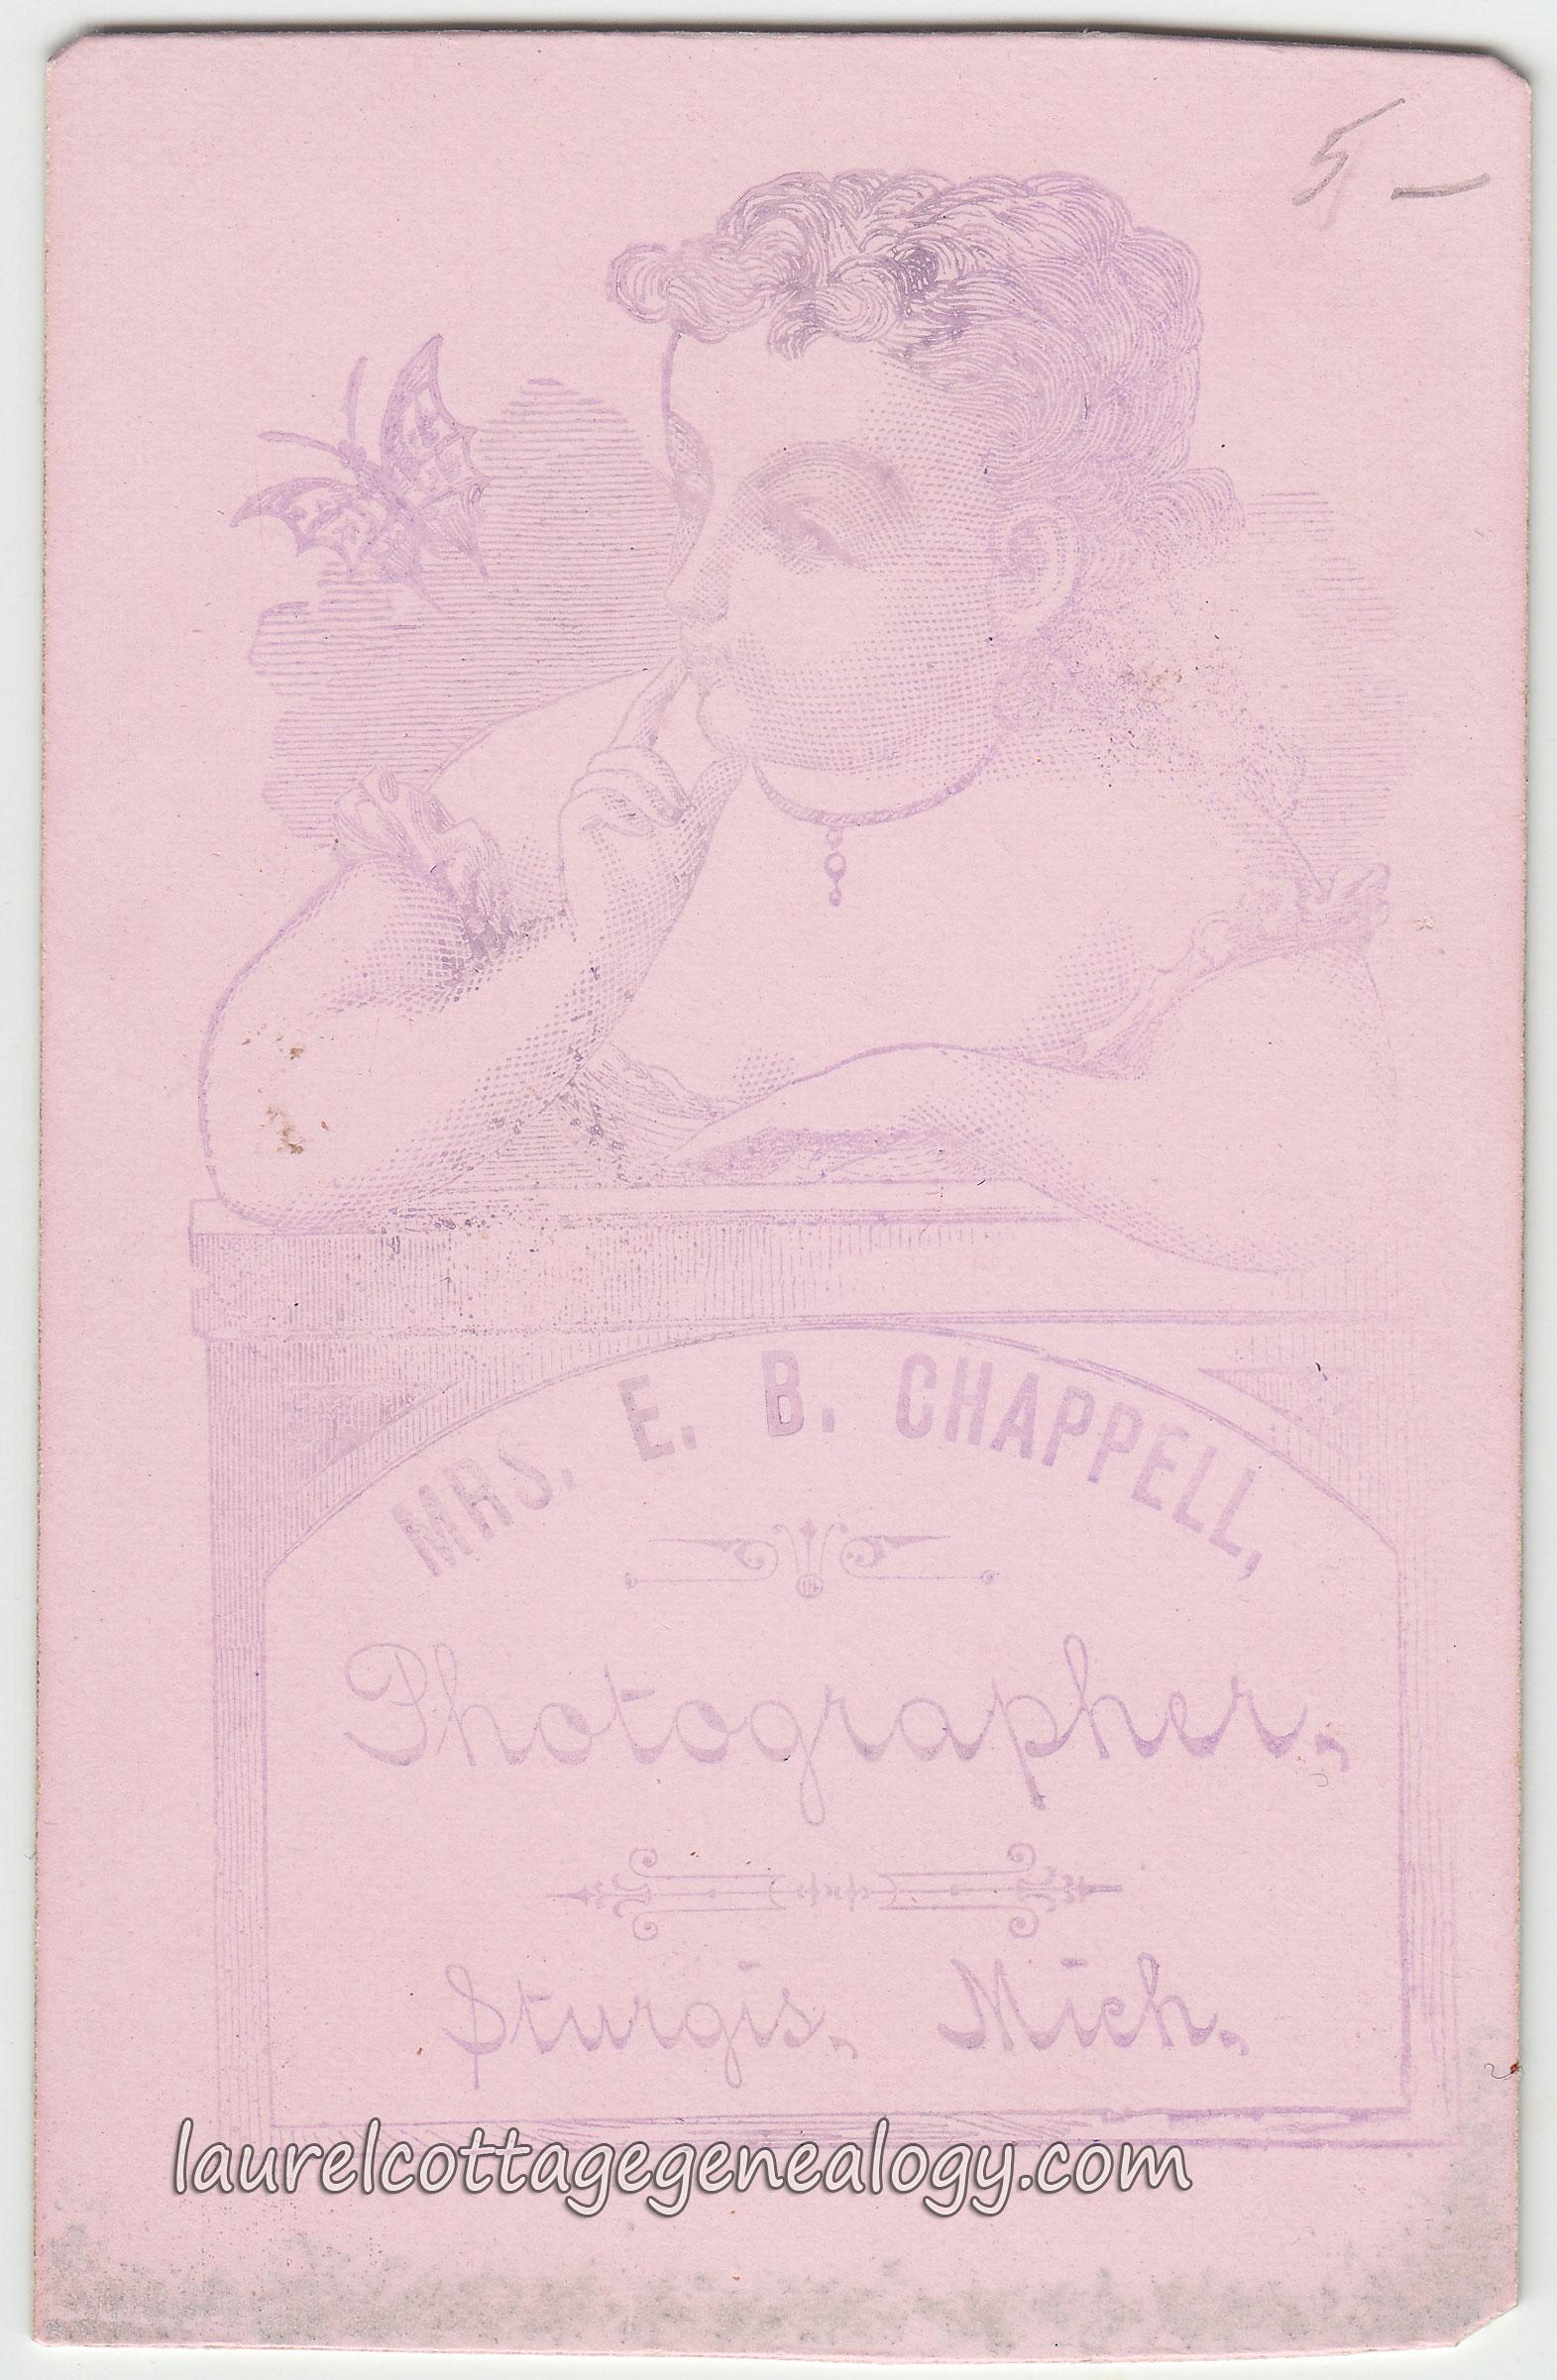 Carte De Visite Circa 1870s Mid 1880s Photographer Mrs E B Chappell